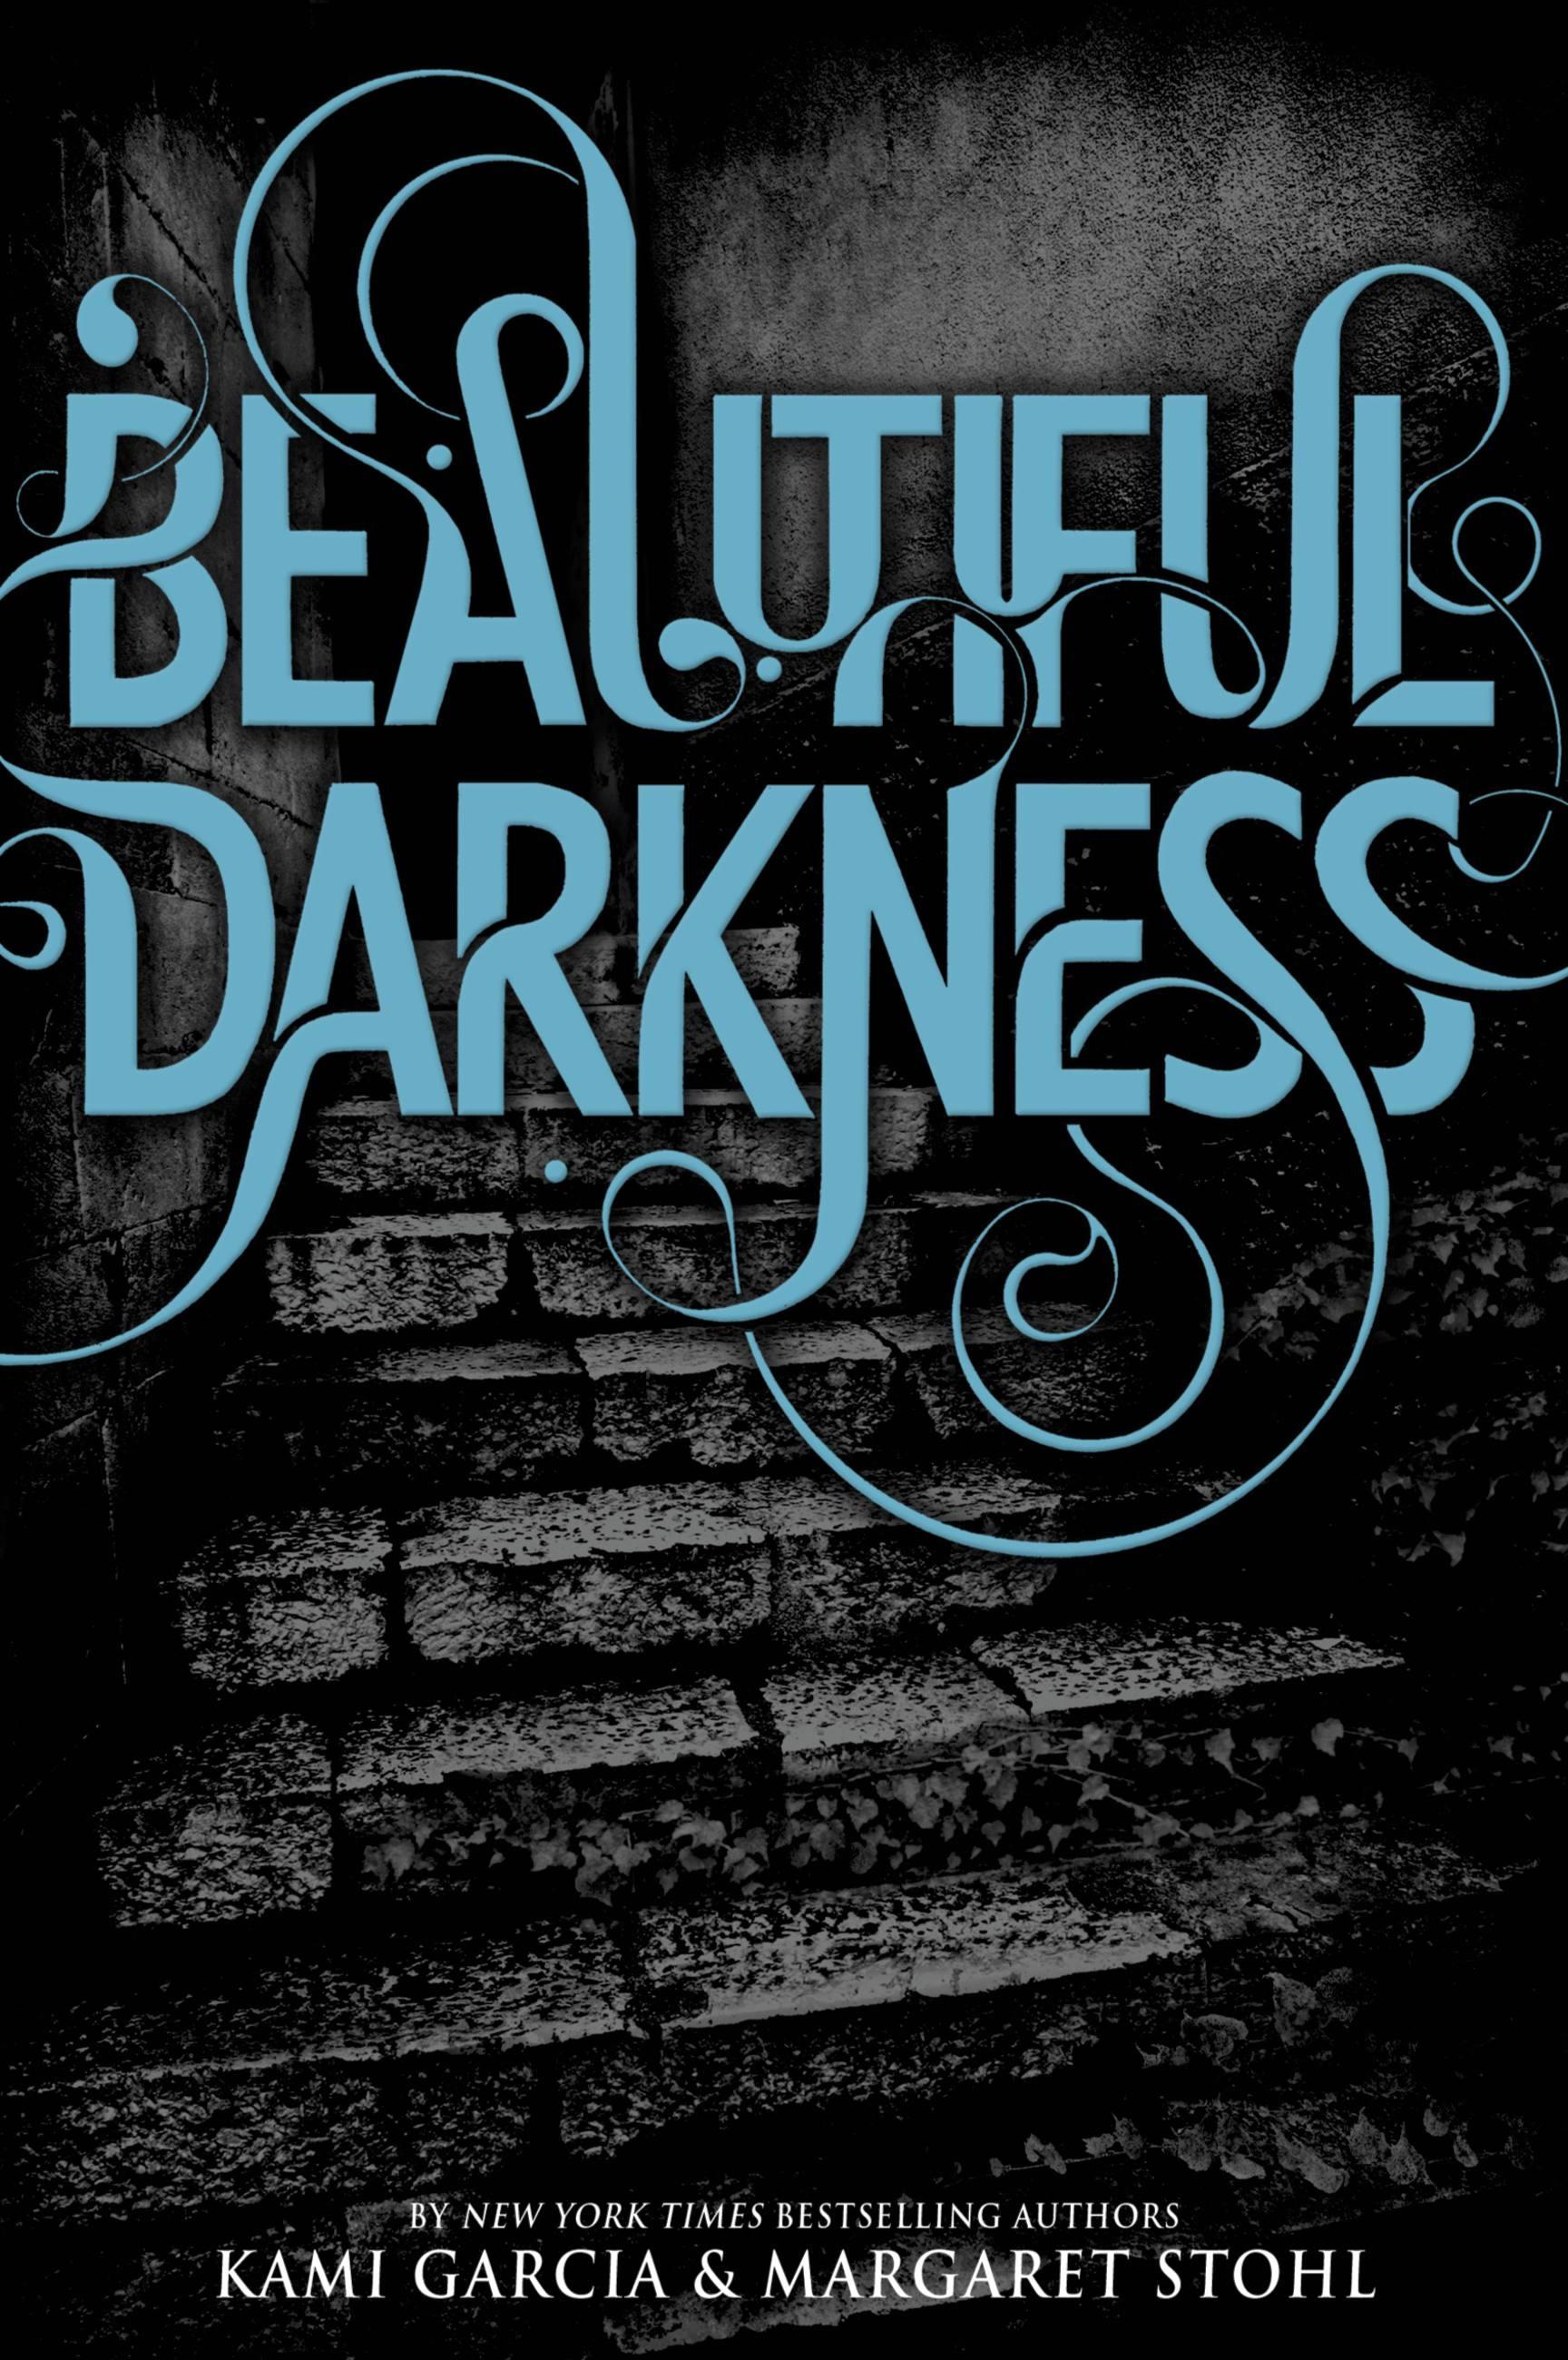 Beautiful Darkness by Kami Garcia | Hachette Book Group